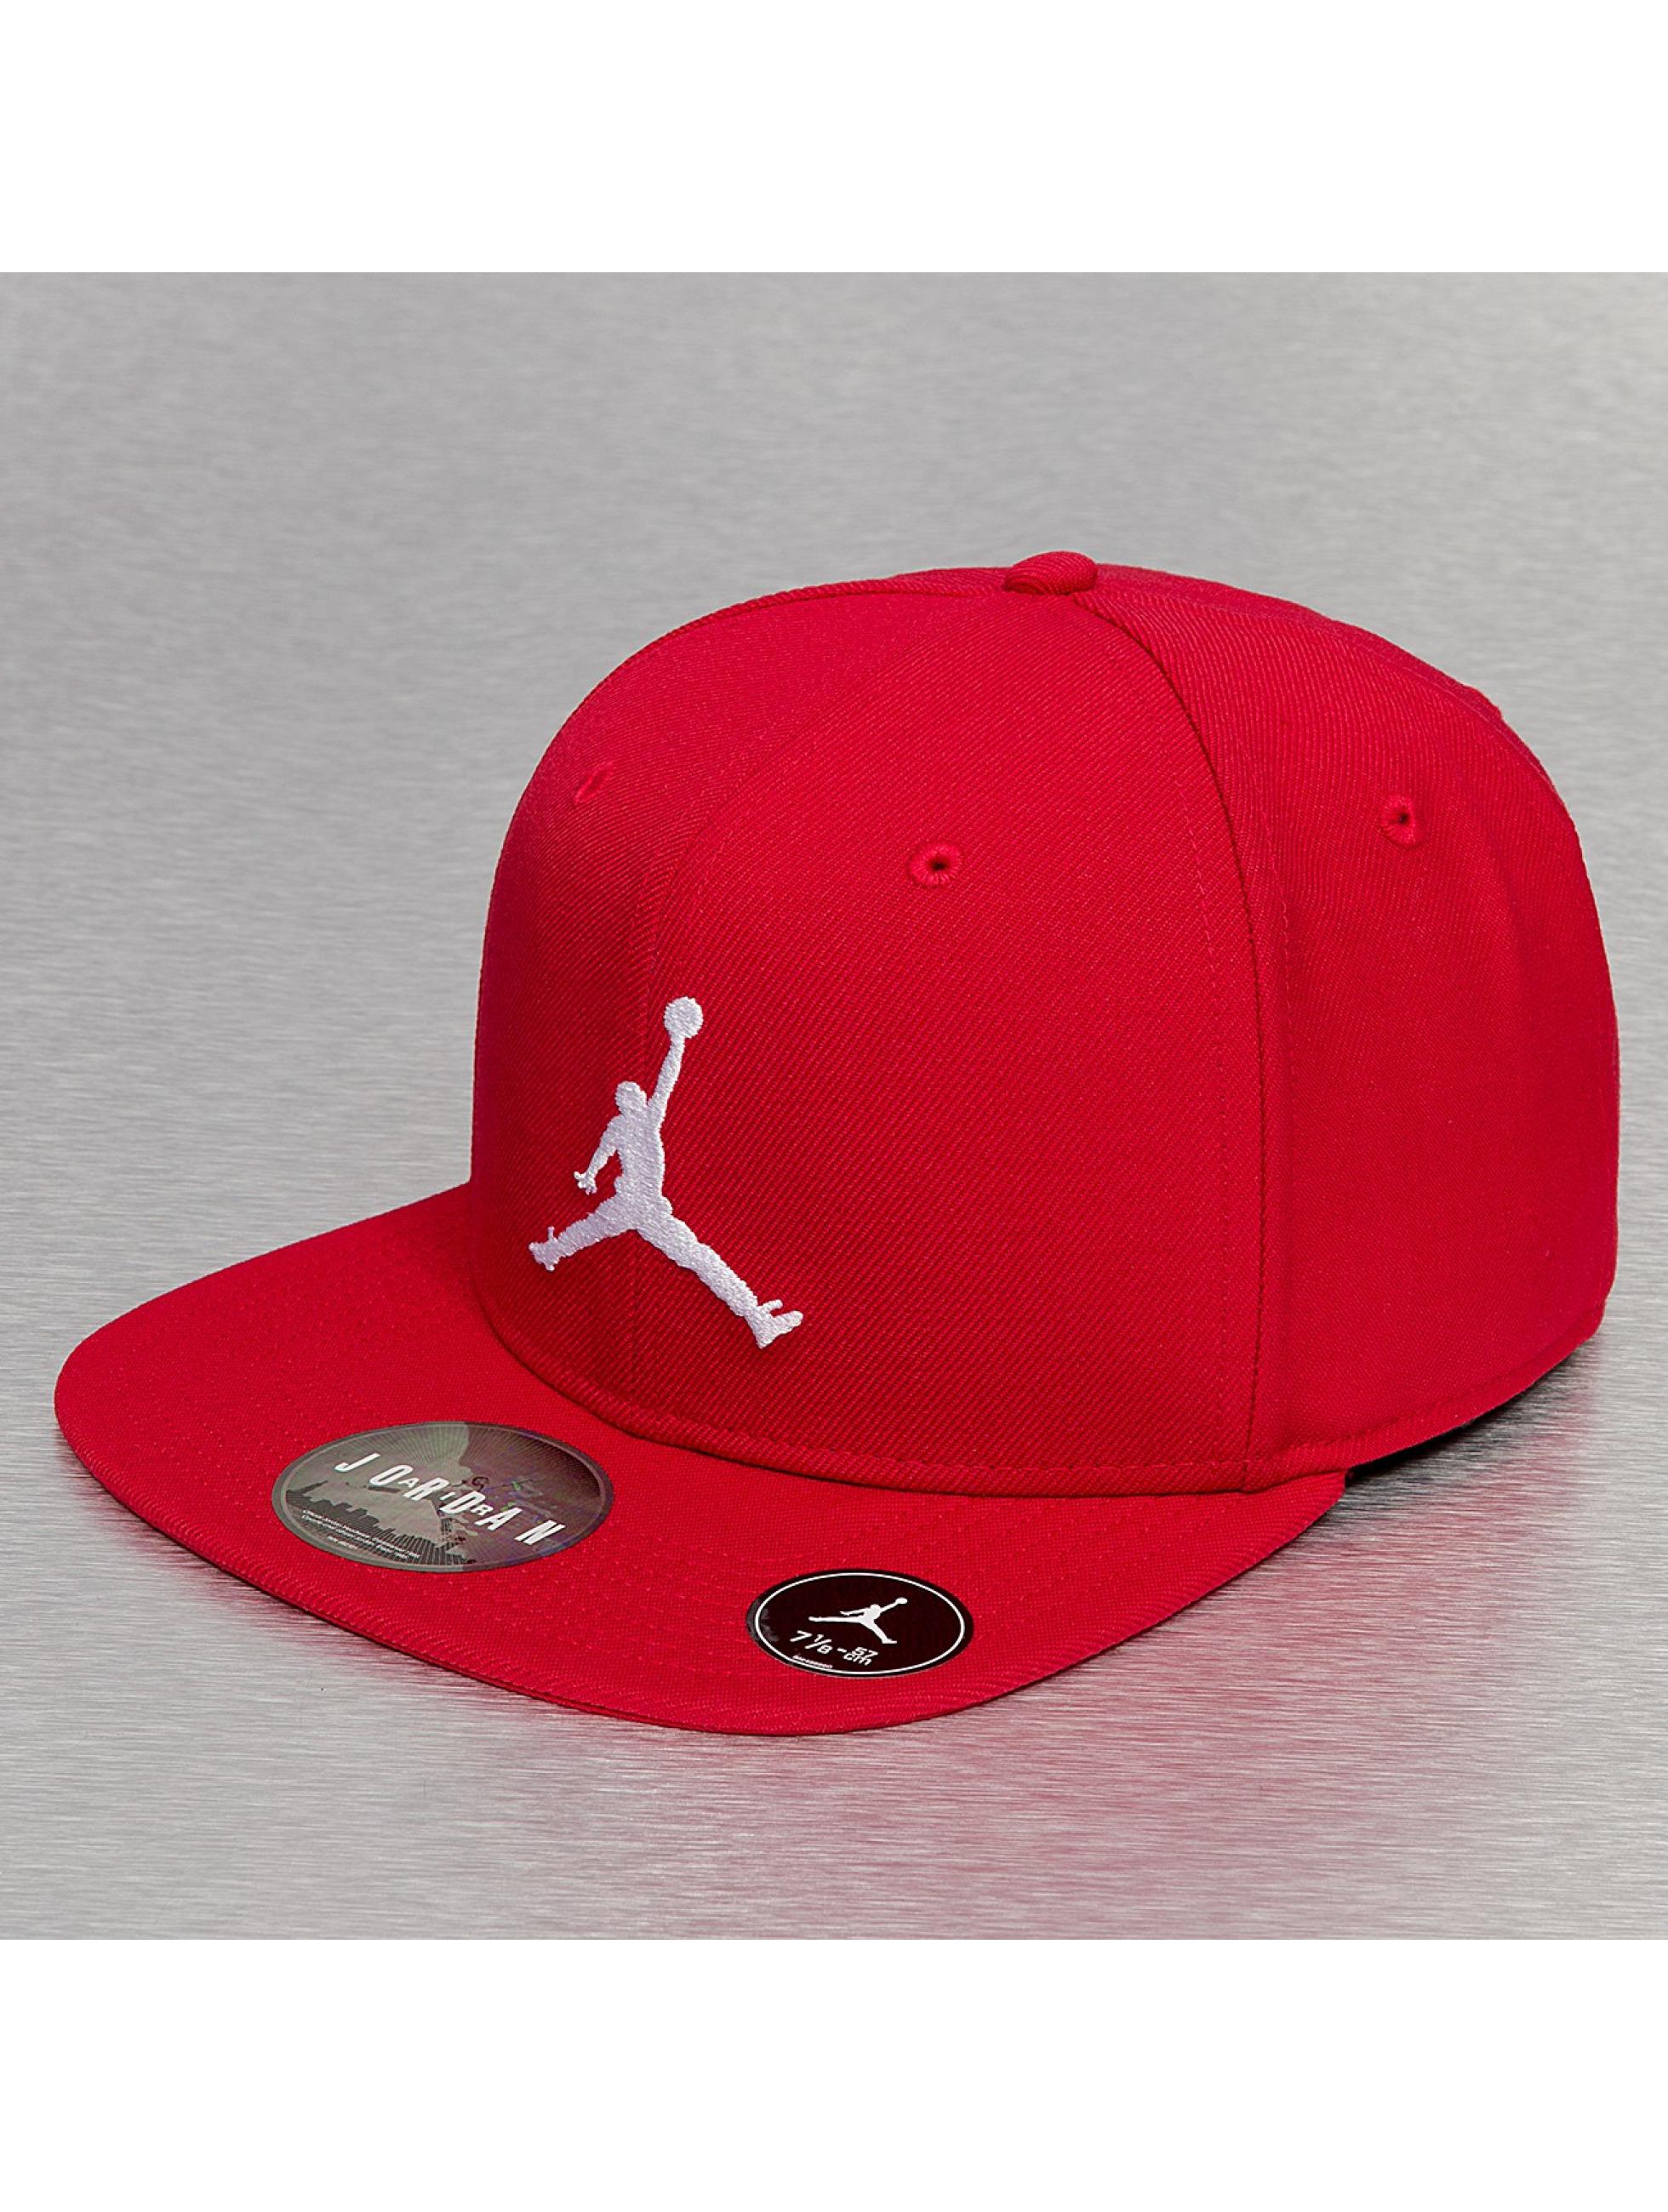 Gimnasio Baños Jordan:Jordan Gorra / Gorra plana Jumpman en rojo